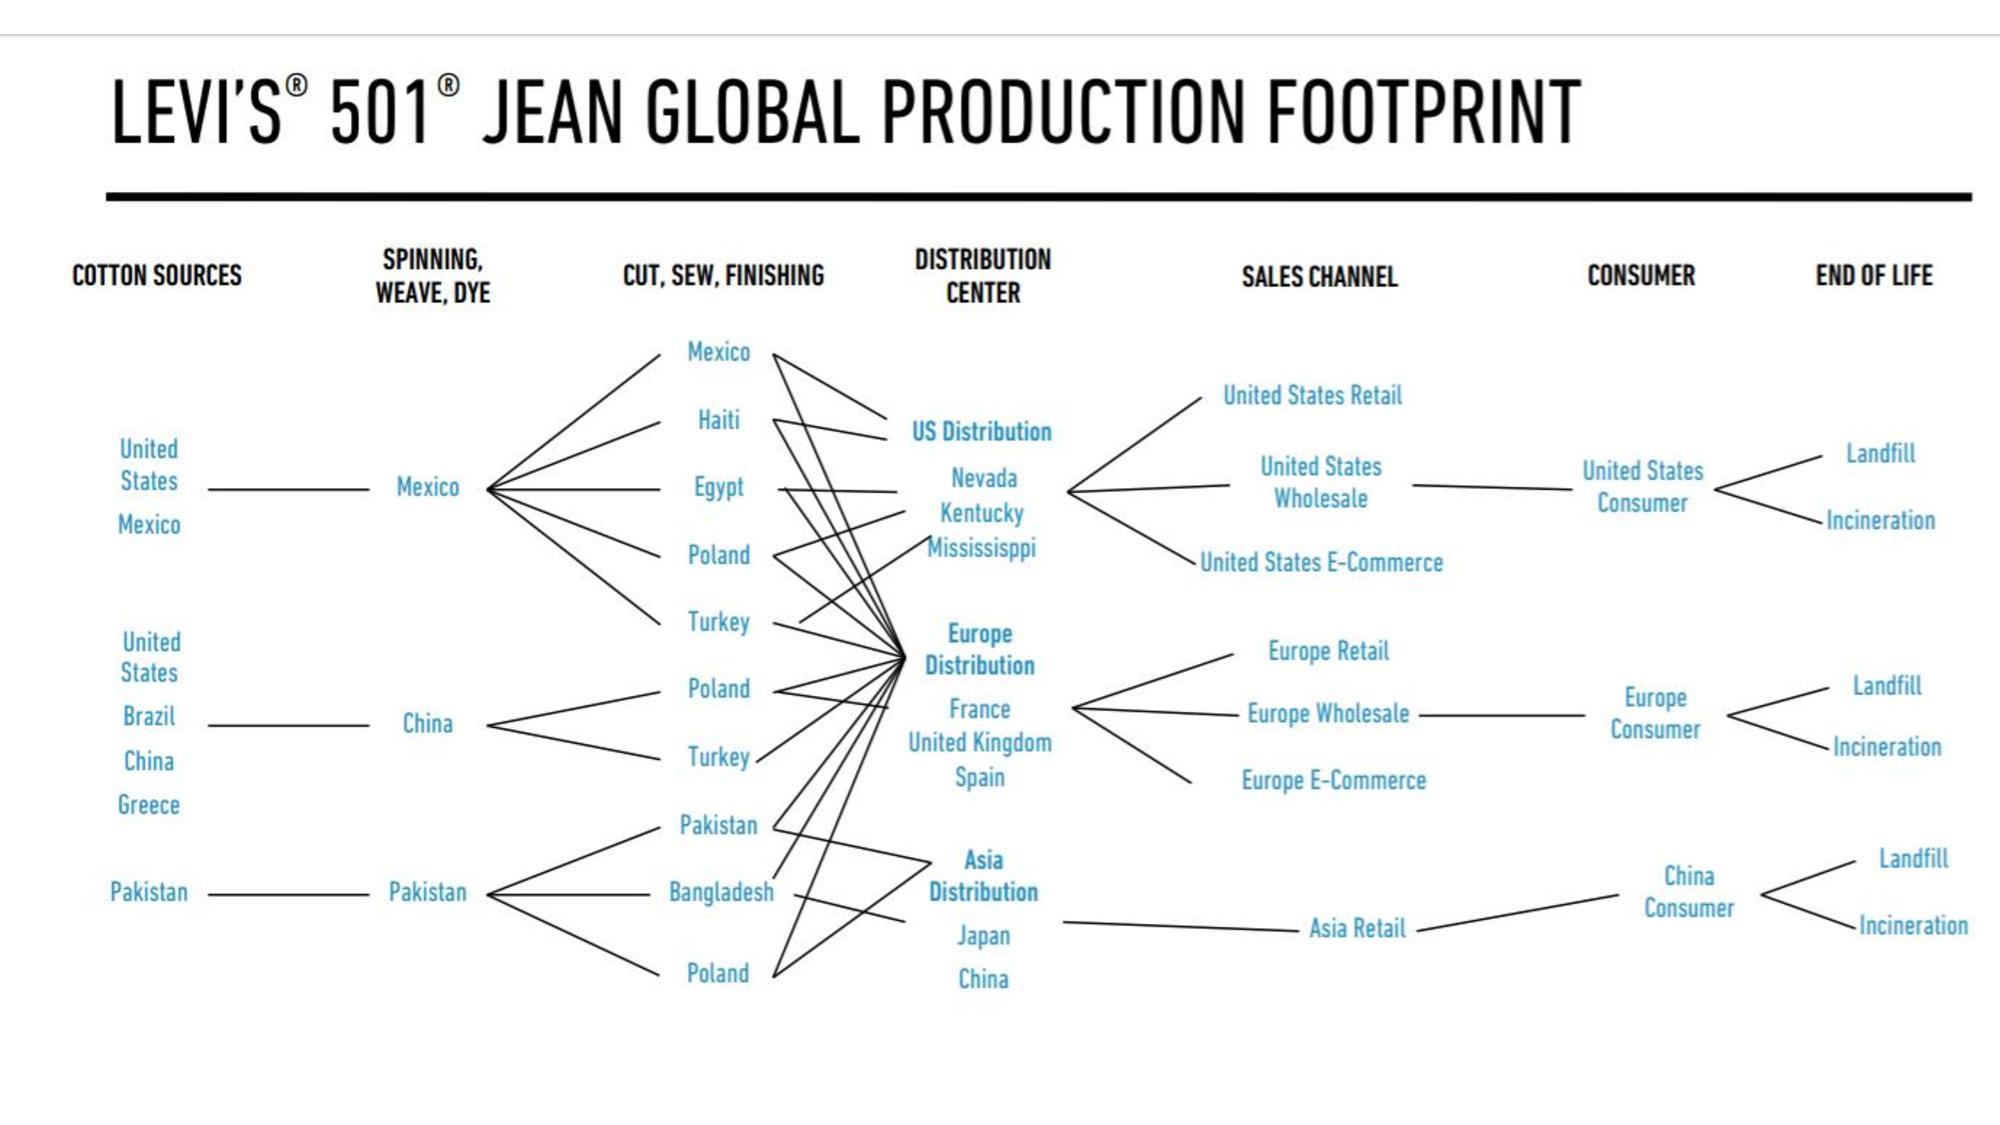 Levi's Global Production Footprint